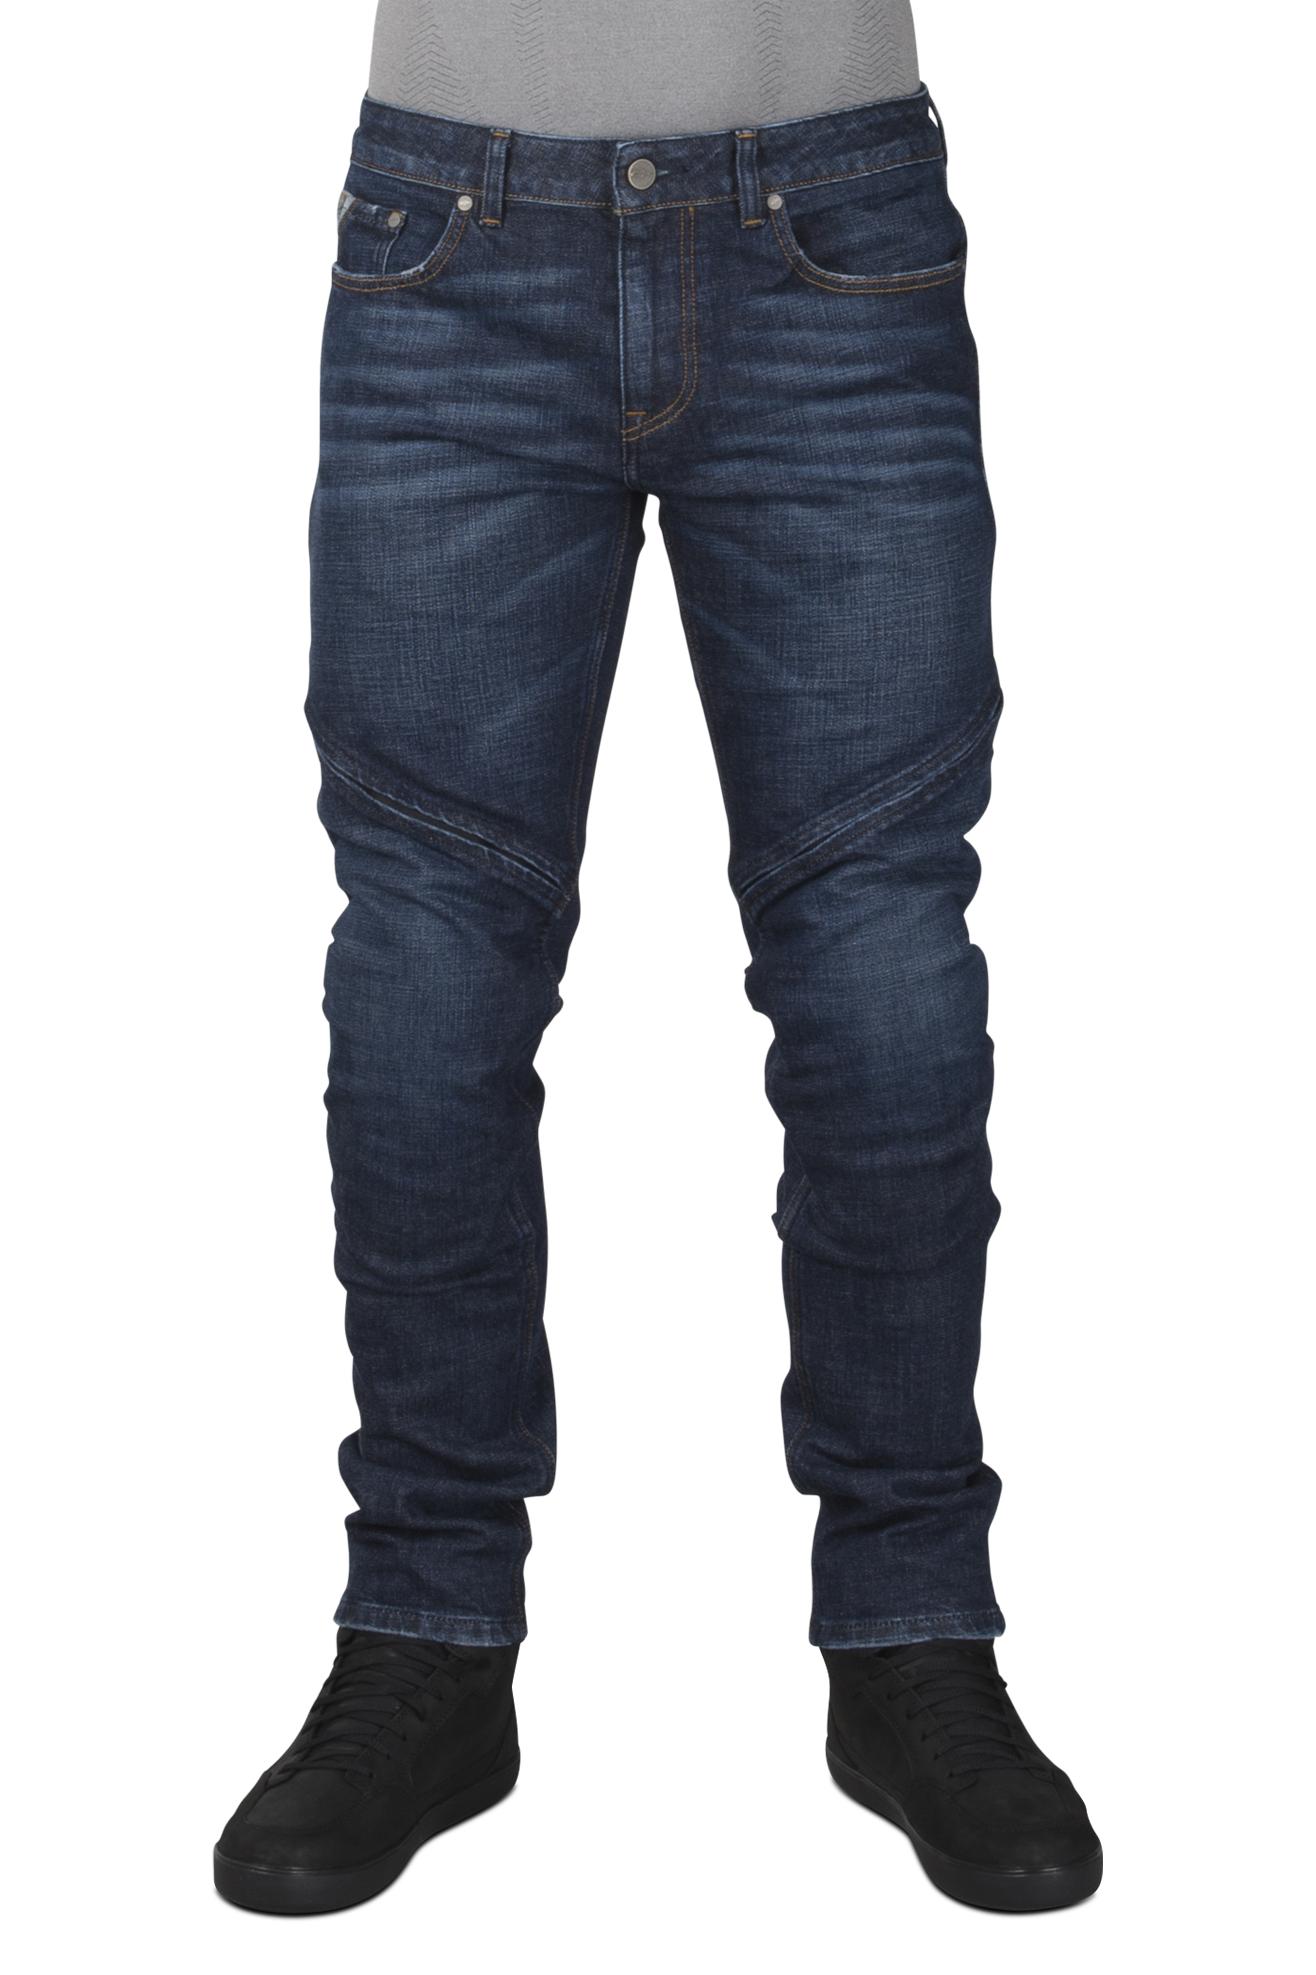 Alpinestars Pantalon Alpinestars Copper Out Jeans Dark